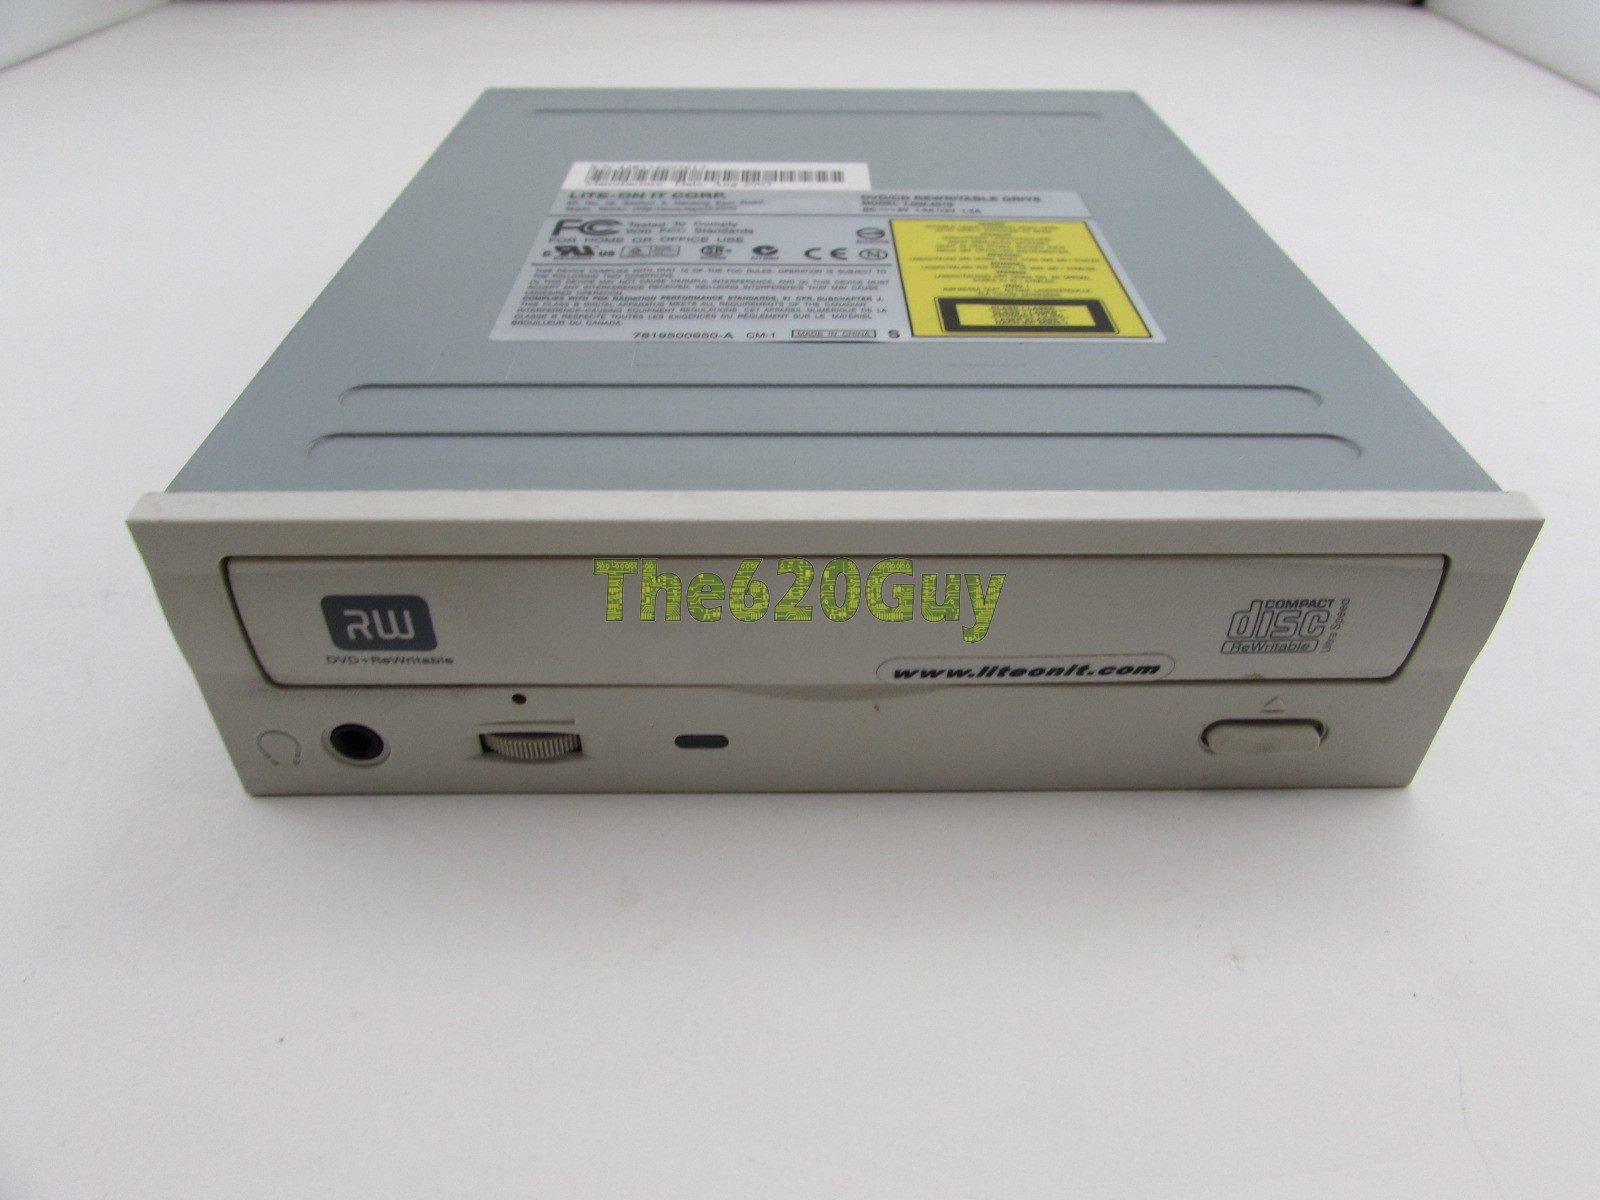 LITE-ON DVD RW LDW-401S - driver software